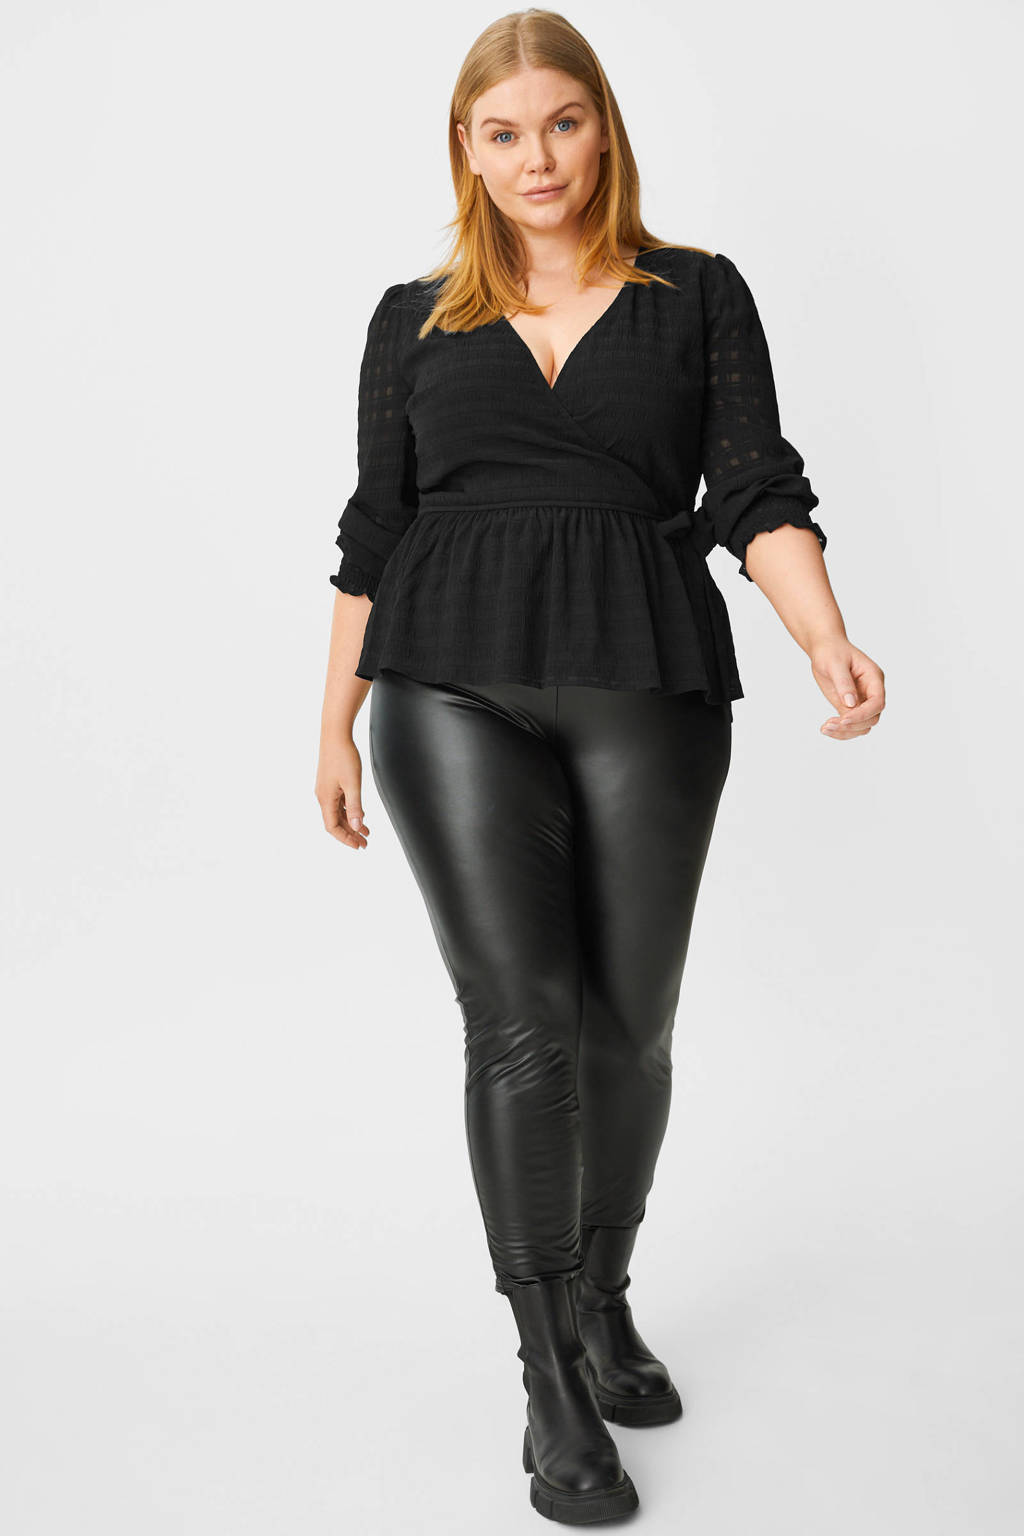 C&A Clockhouse geruite semi-transparante blouse zwart, Zwart